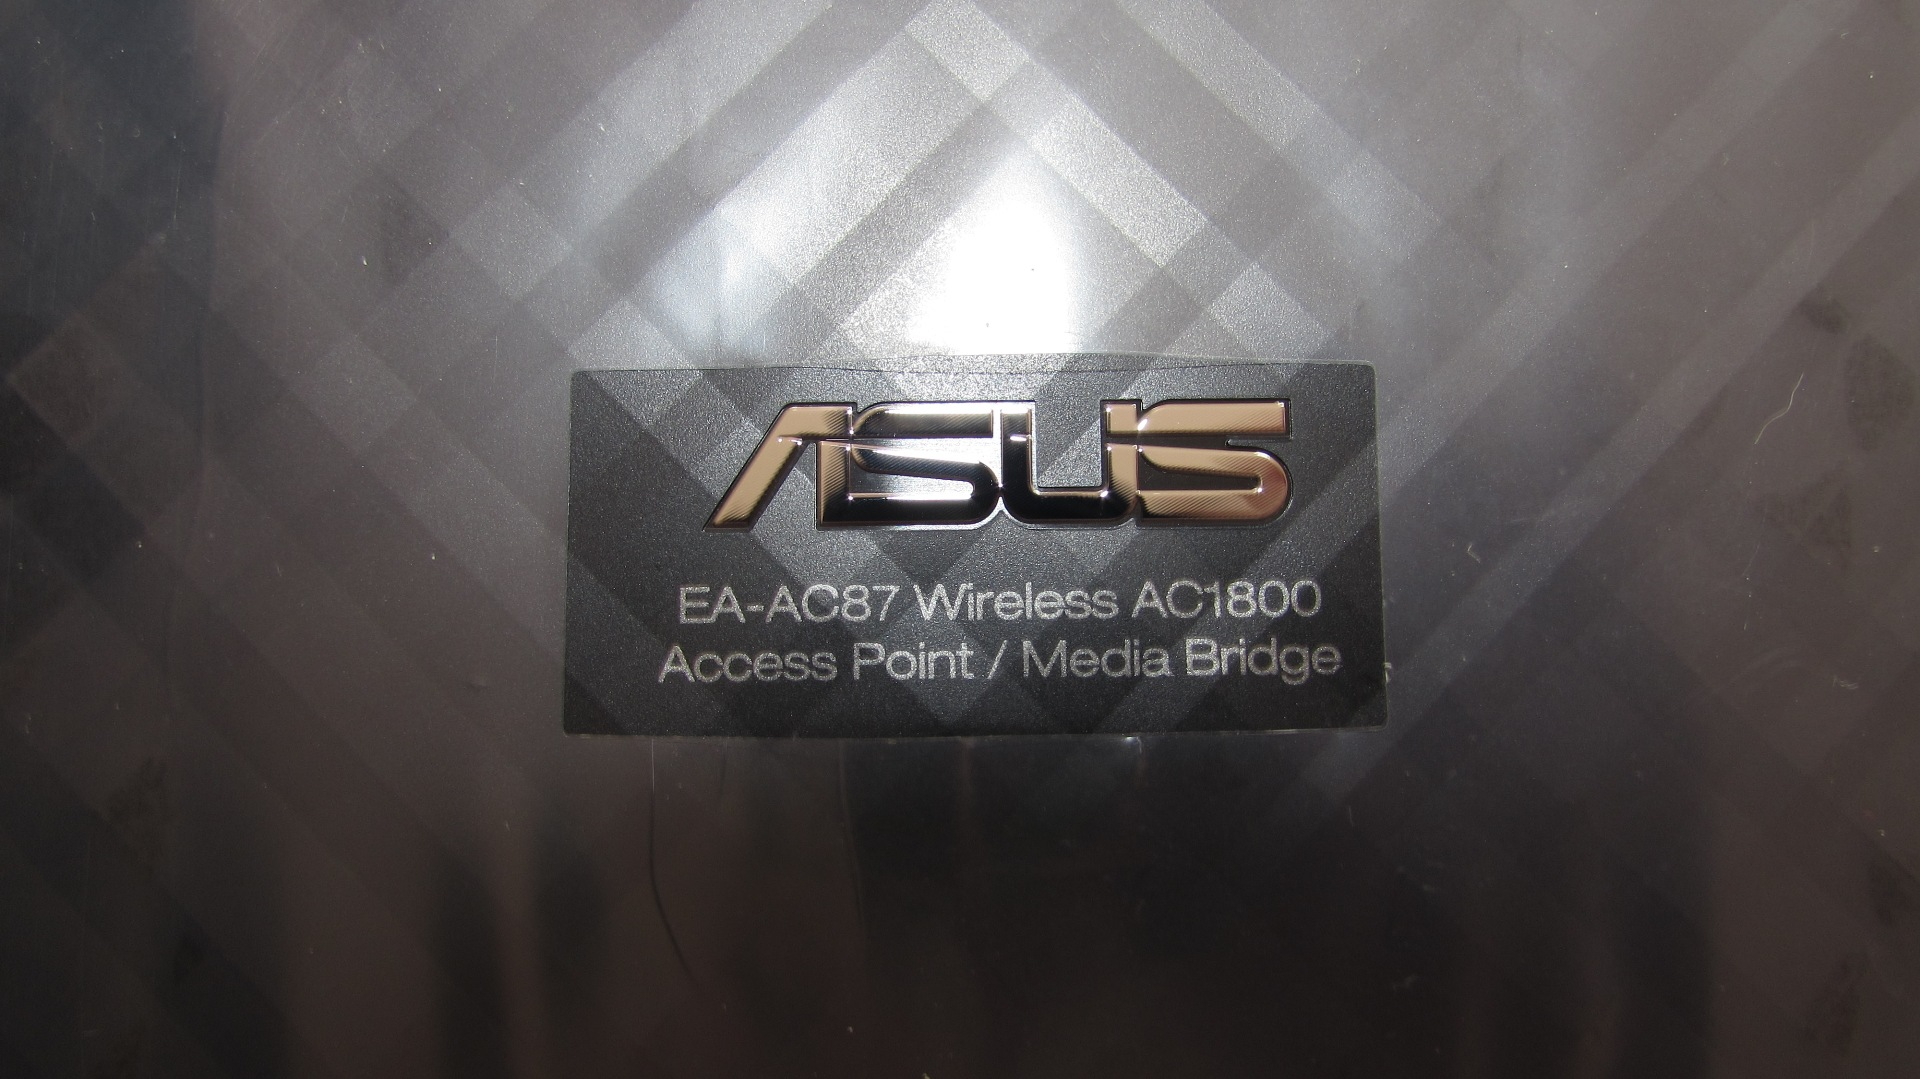 openlinksys.info/images/EA-AC87/IMG_0169.JPG